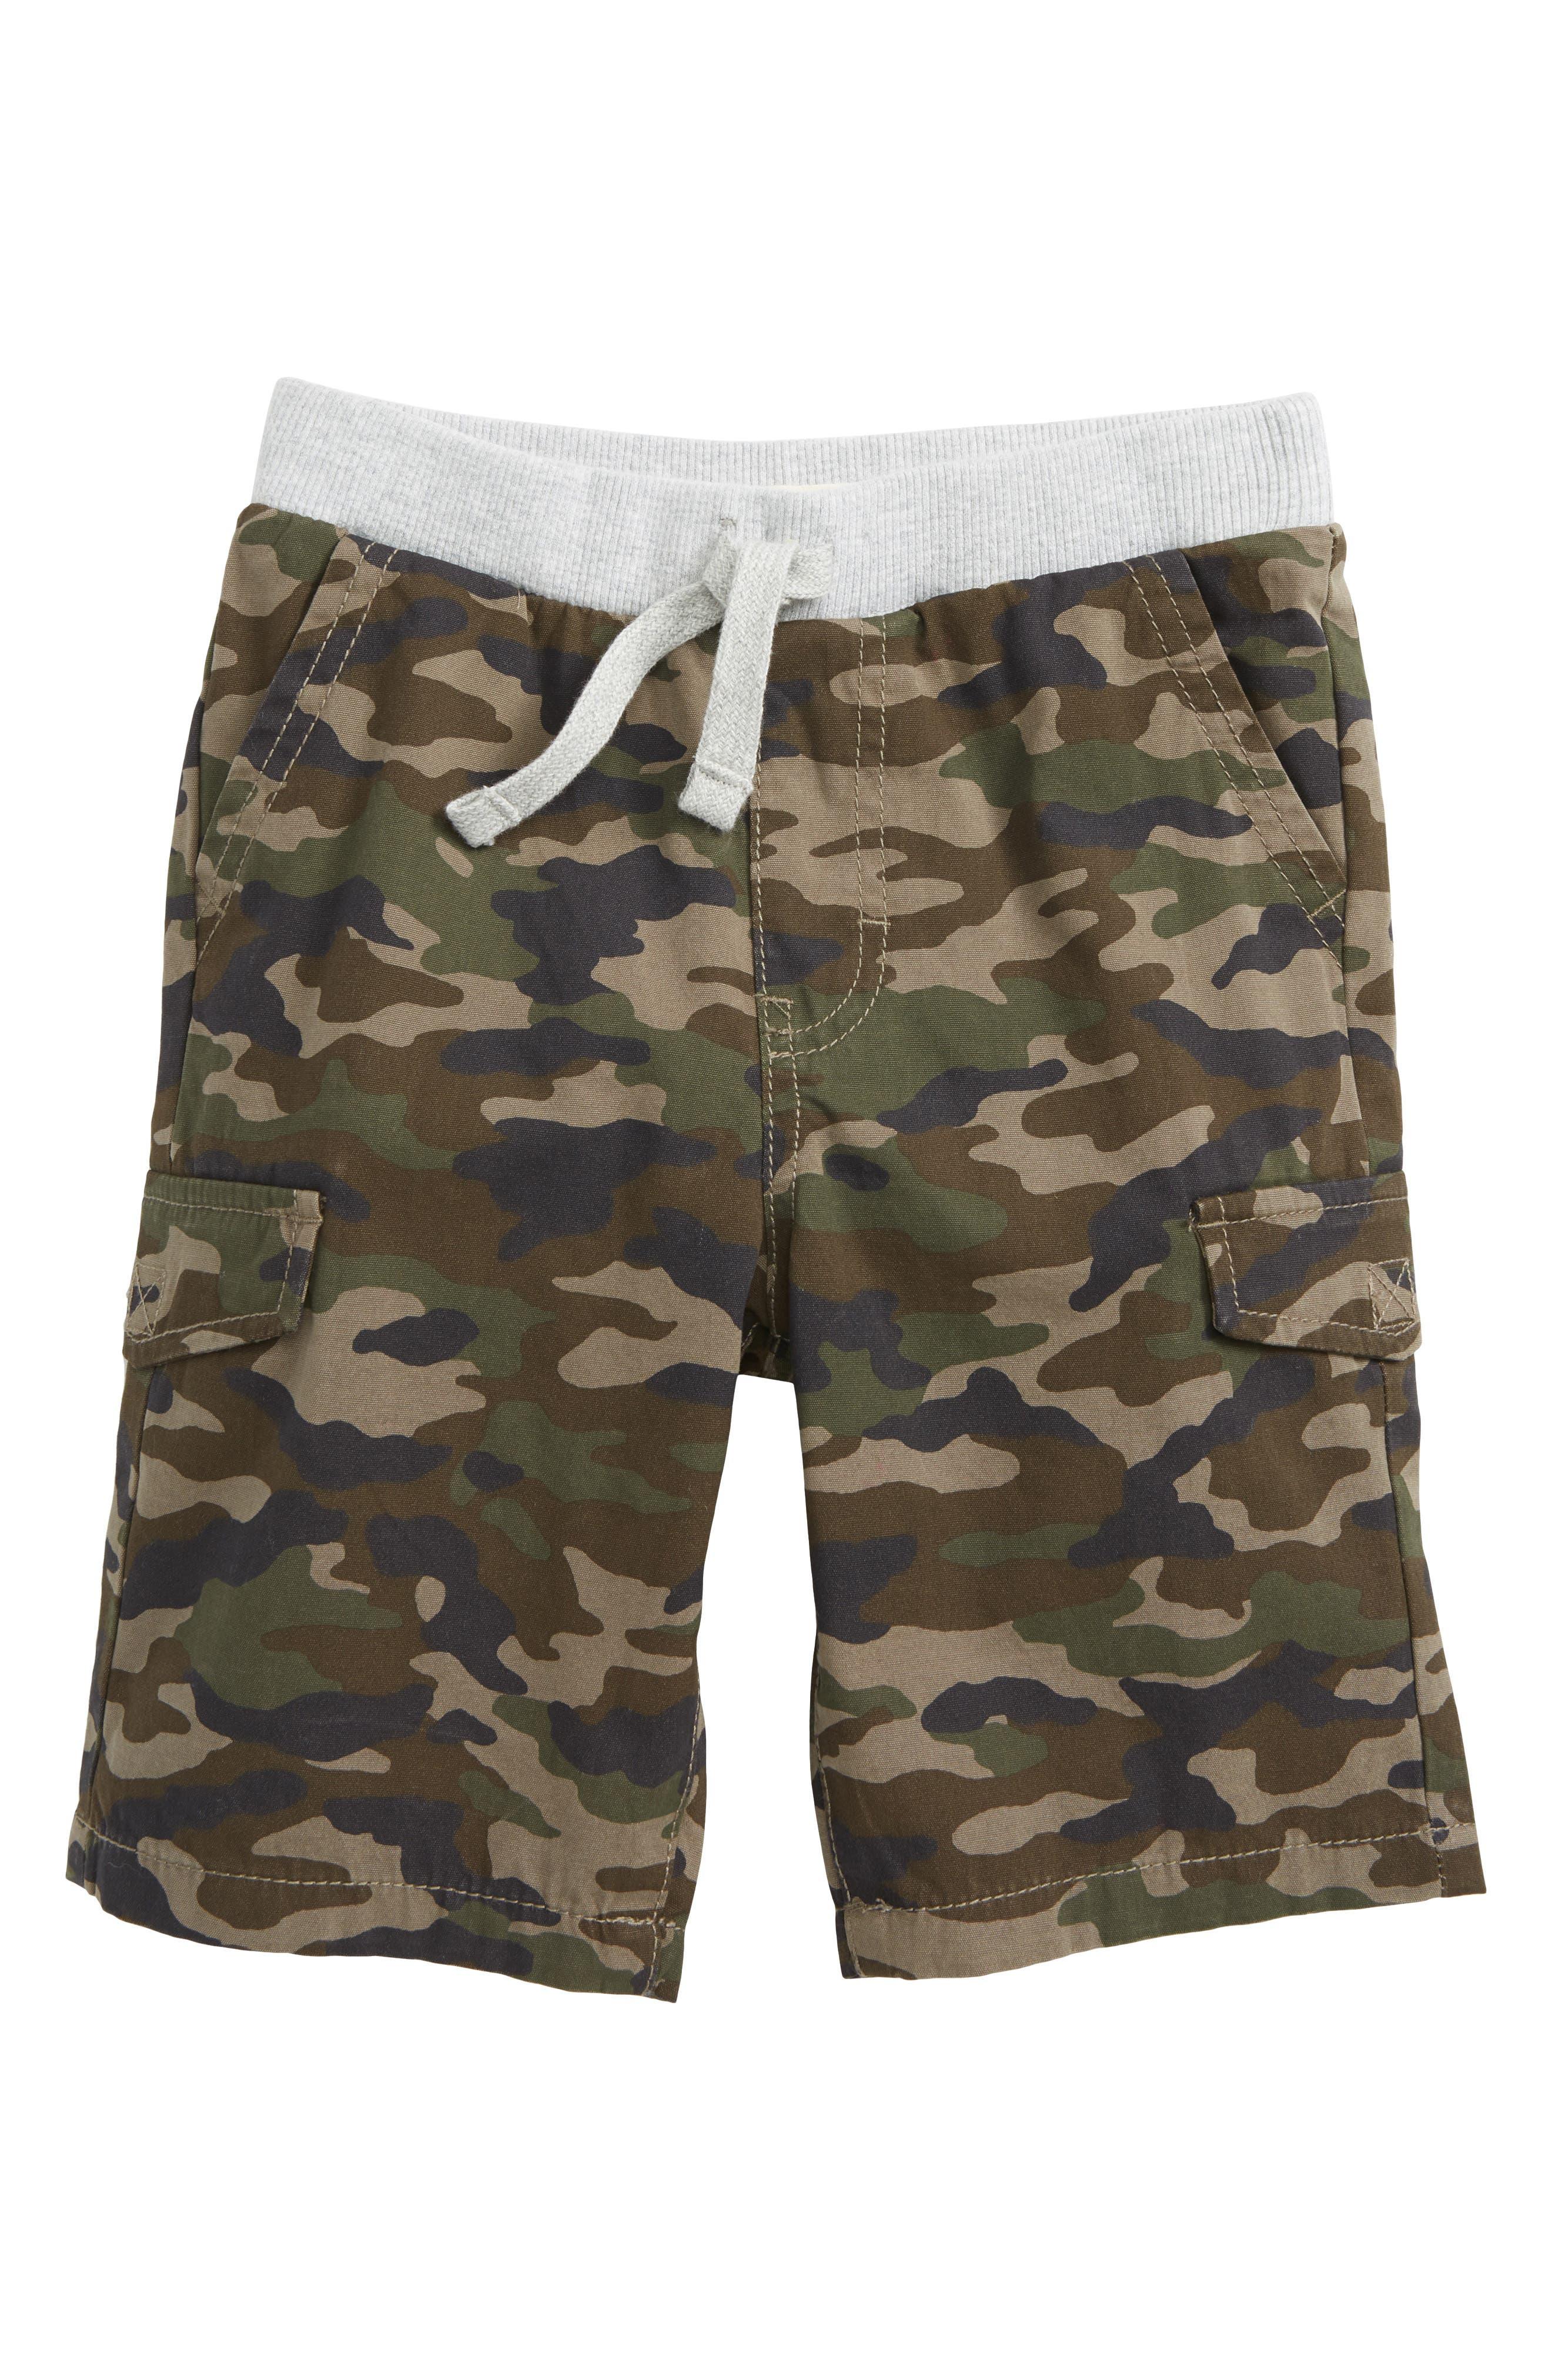 Camo Utility Shorts,                             Main thumbnail 1, color,                             Olive Brown Camo